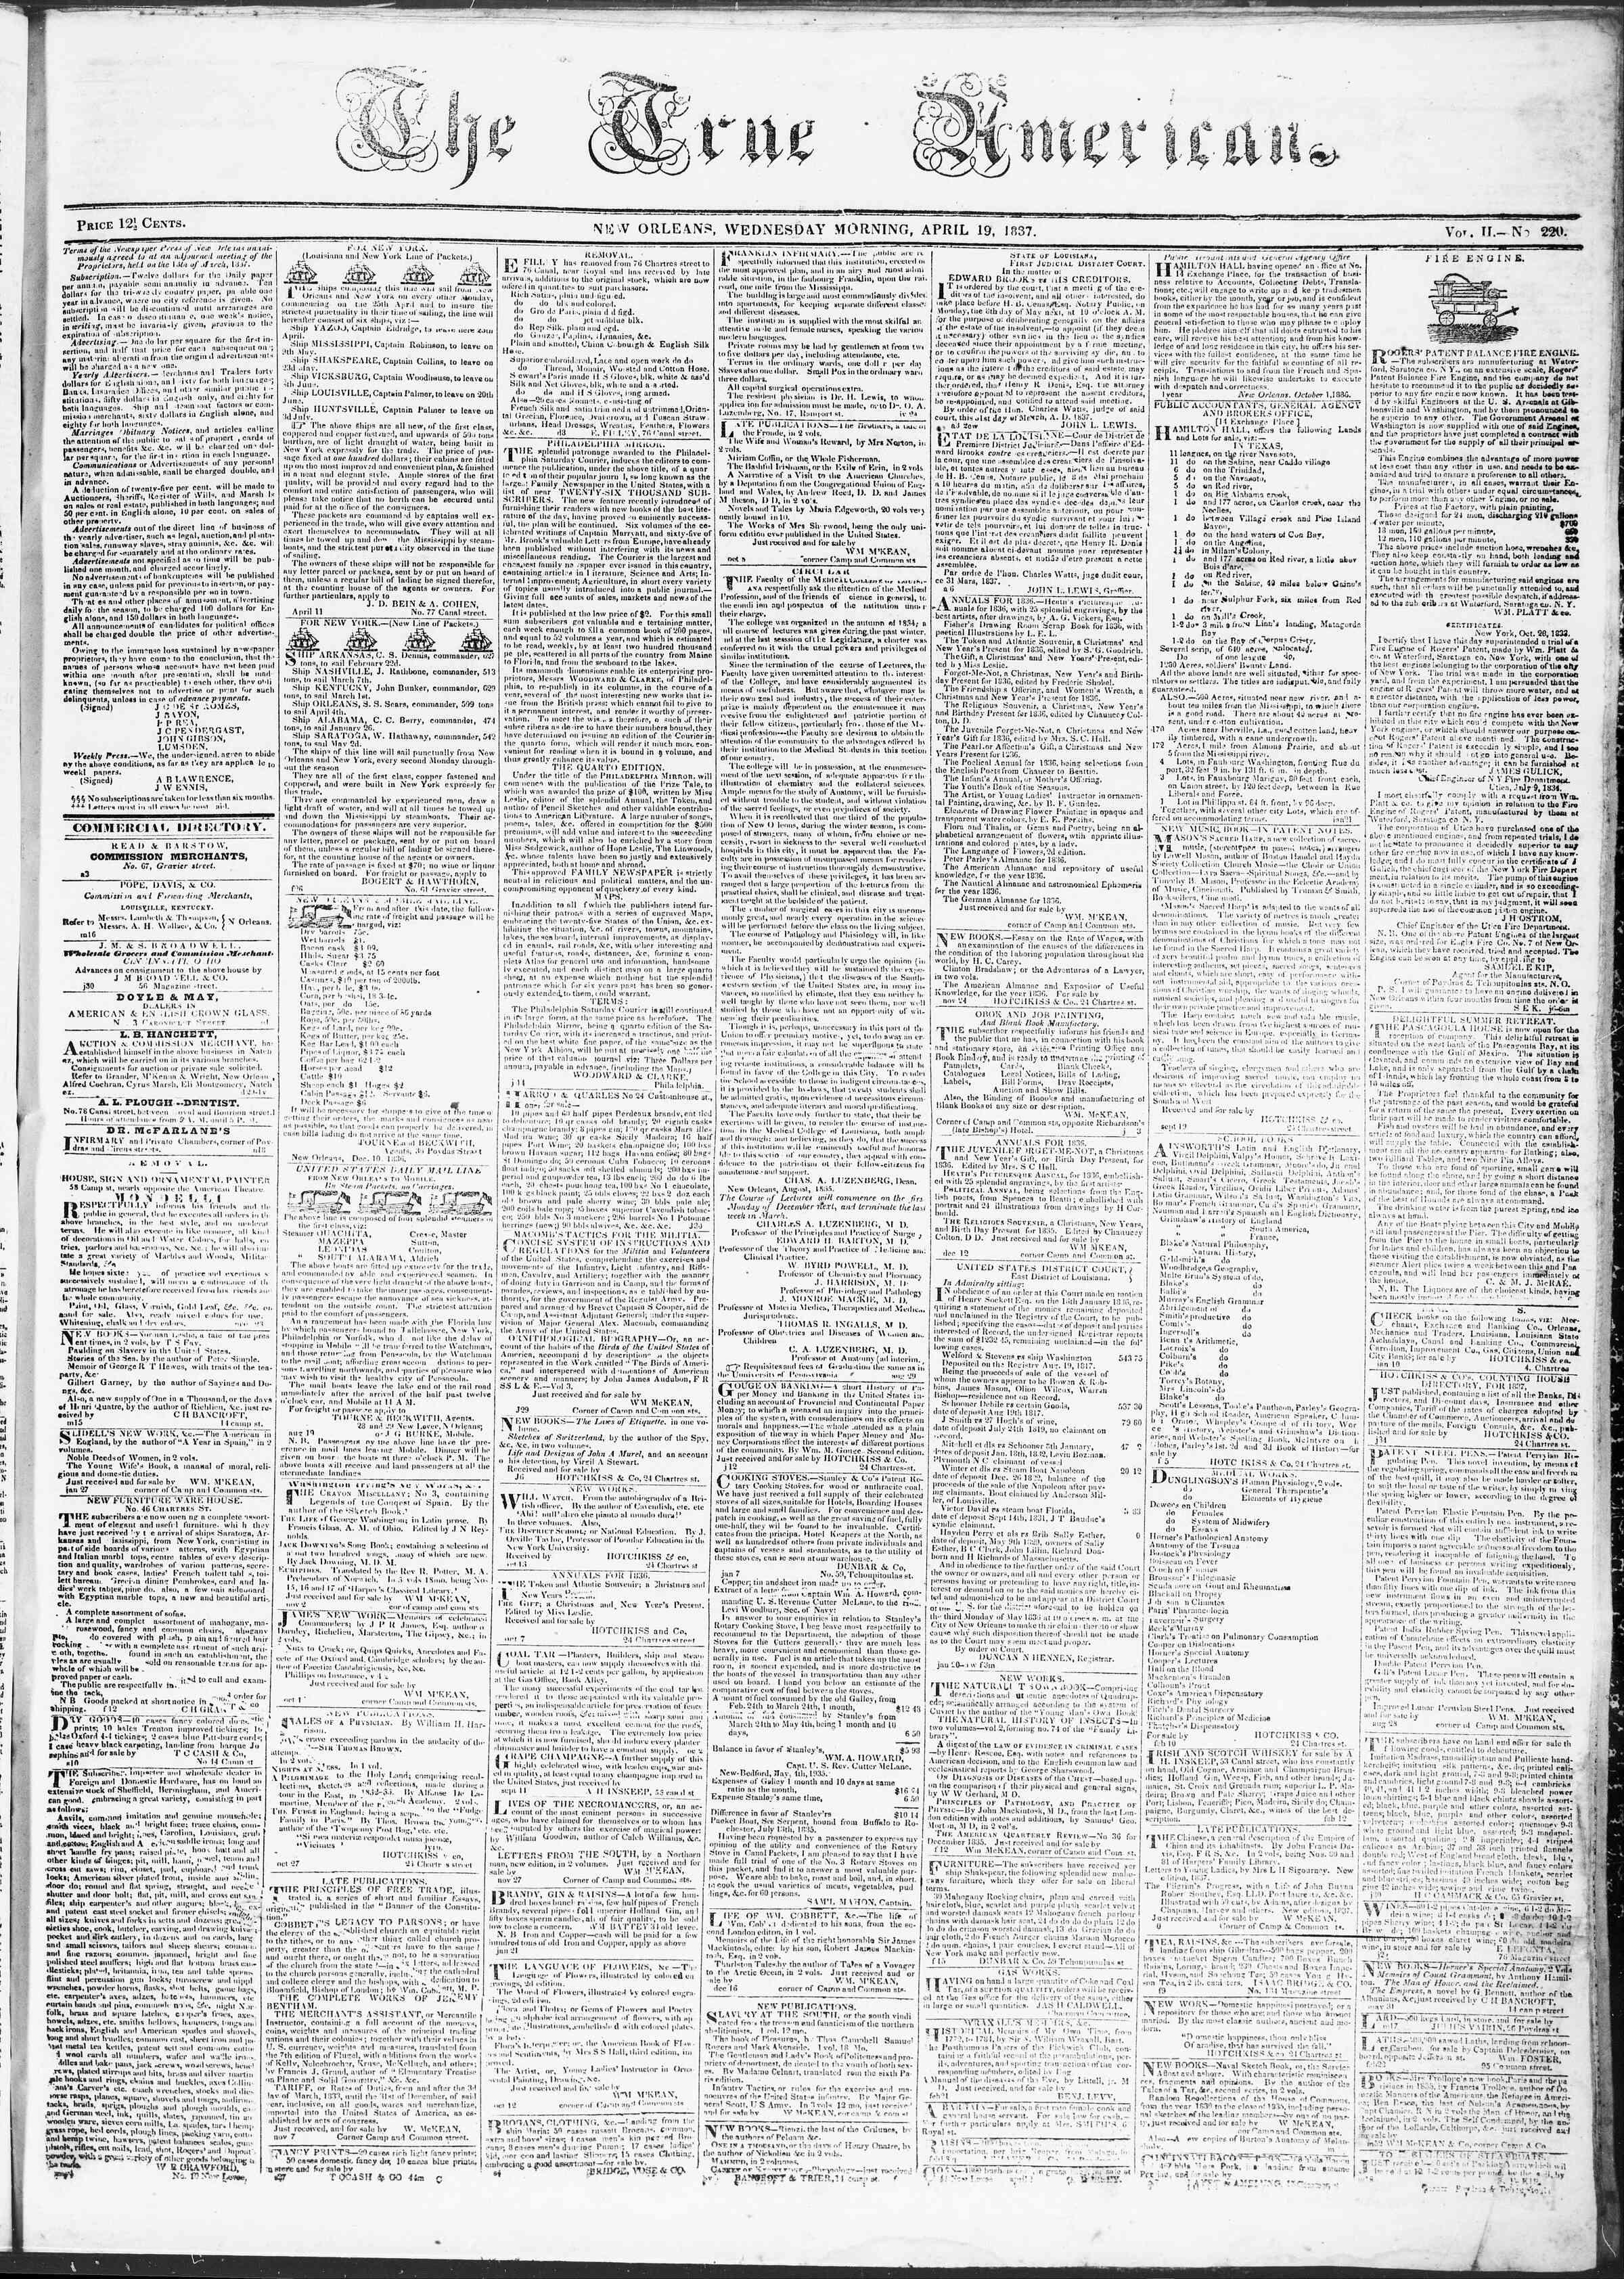 April 19, 1837 Tarihli True American Gazetesi Sayfa 1